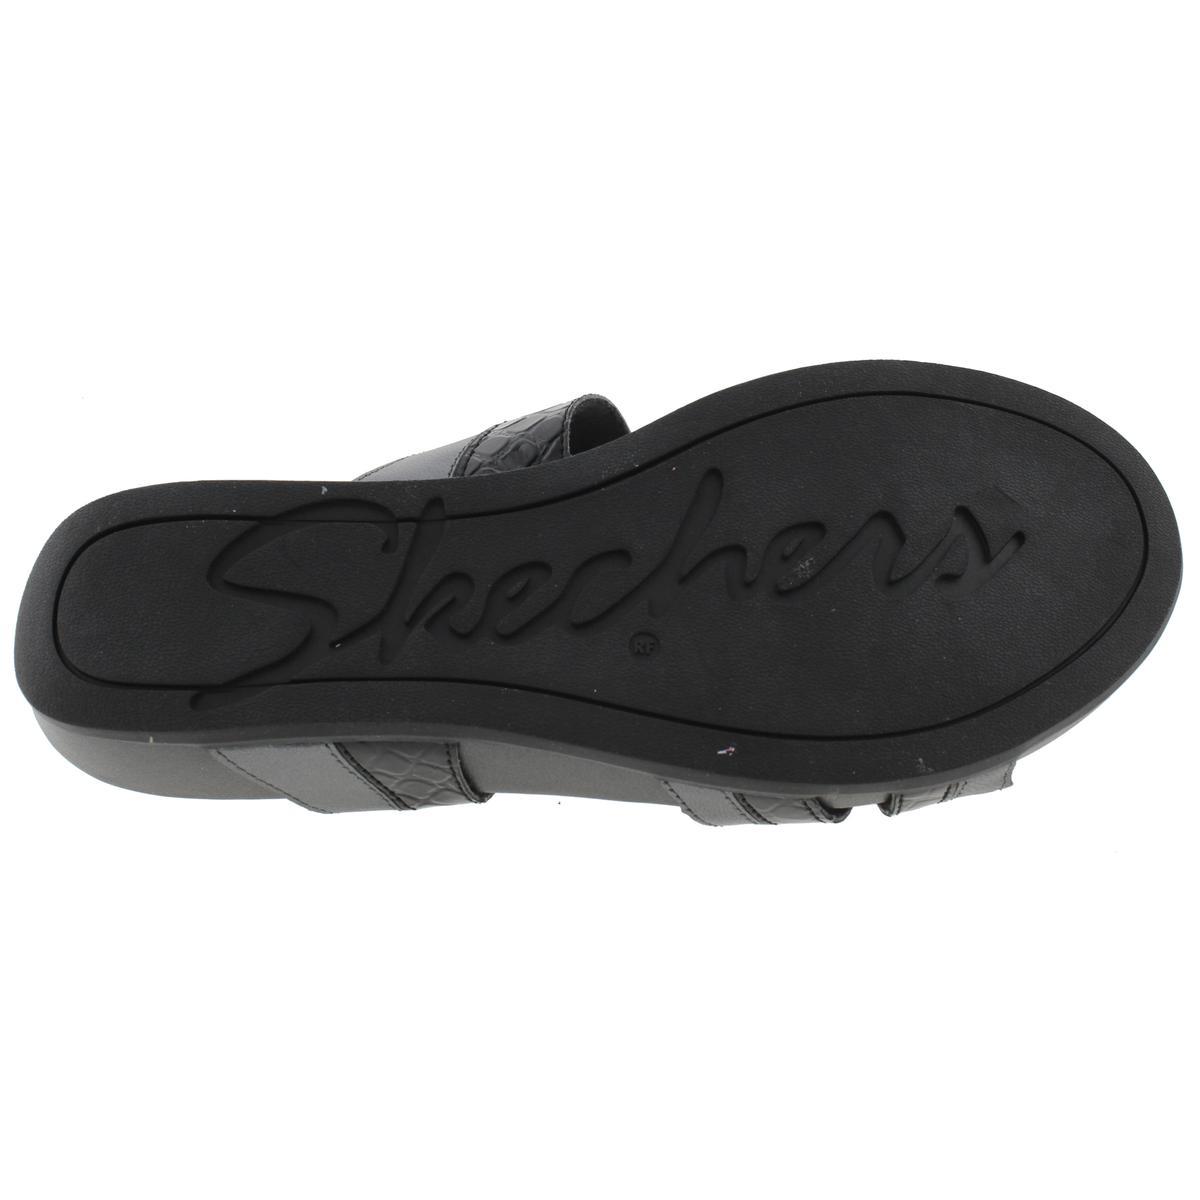 Skechers Womens Palm Springs Wedge Leather Contrast Trim Wedge Springs Sandals 24574d